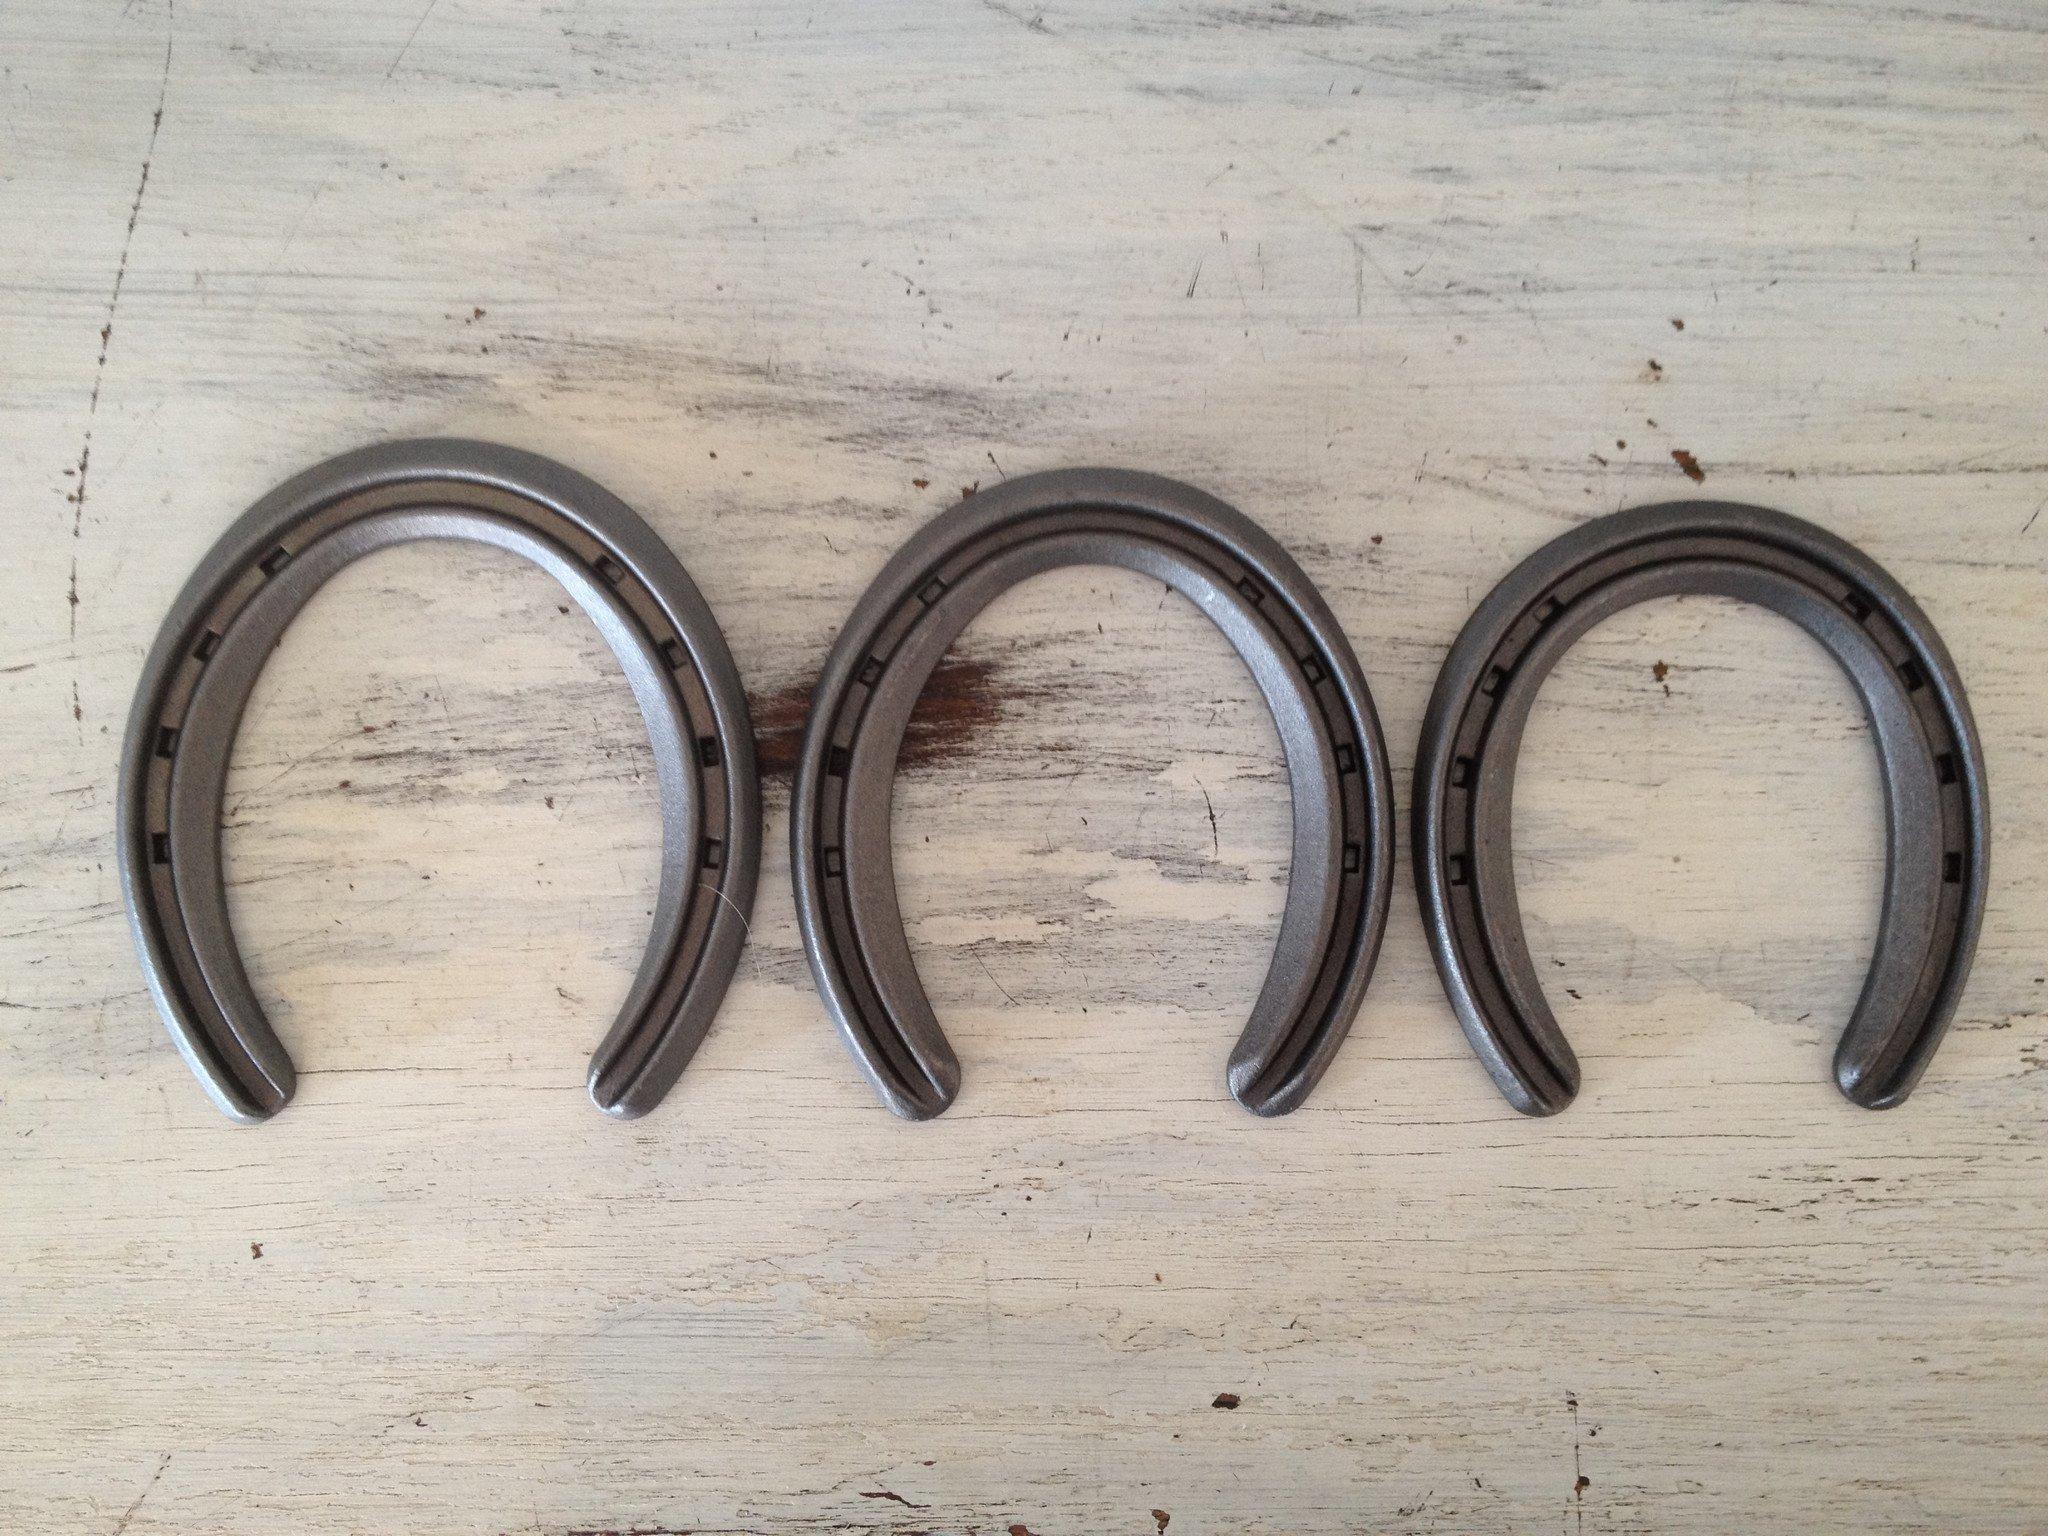 The Heritage Forge - 20 Horseshoes - Lite Rim - Sand Blasted Steel O